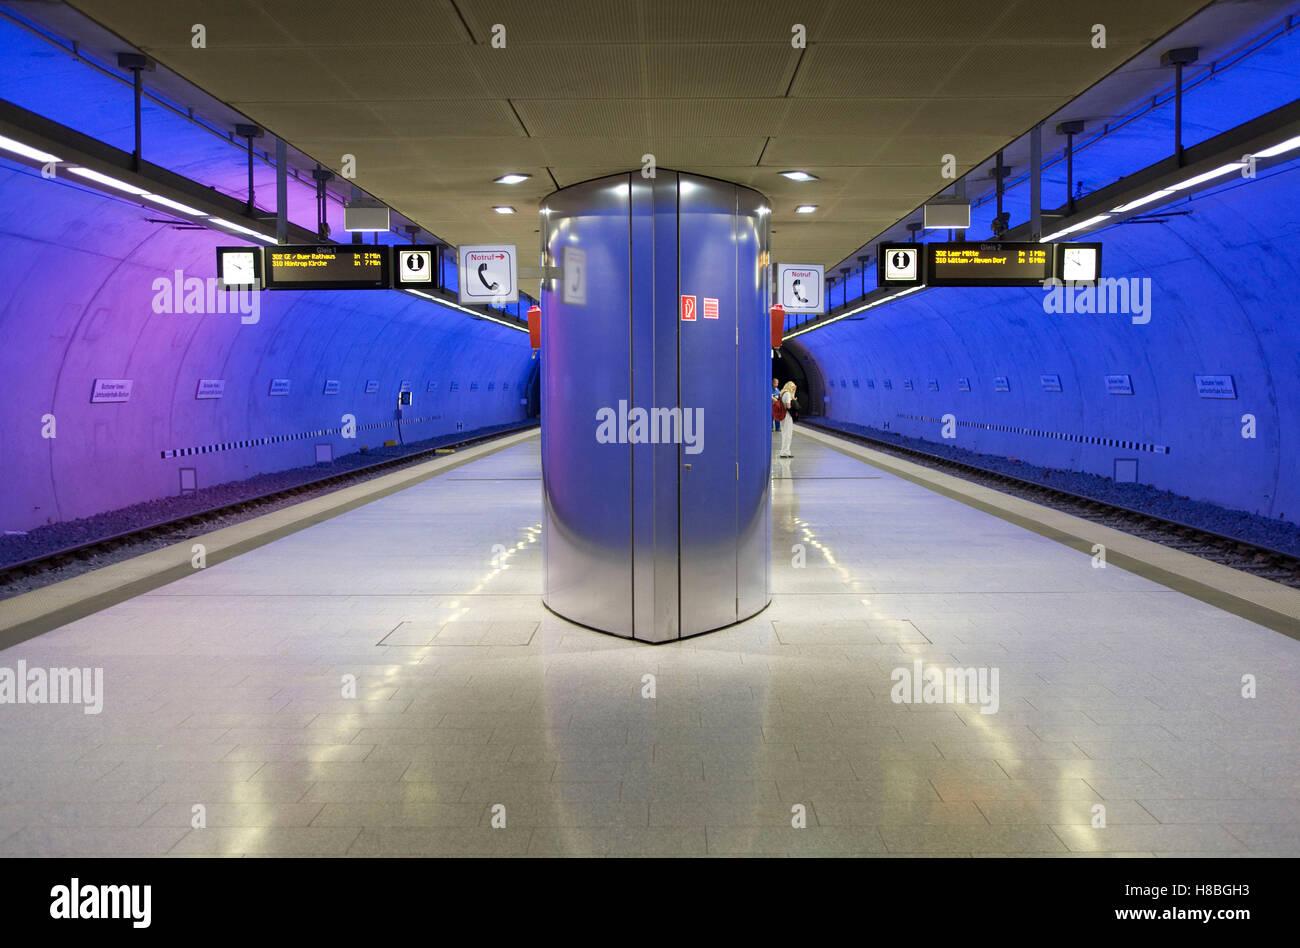 Germany, Ruhr area, Bochum, subway station Bochumer Verein Jahrhunderthalle. - Stock Image